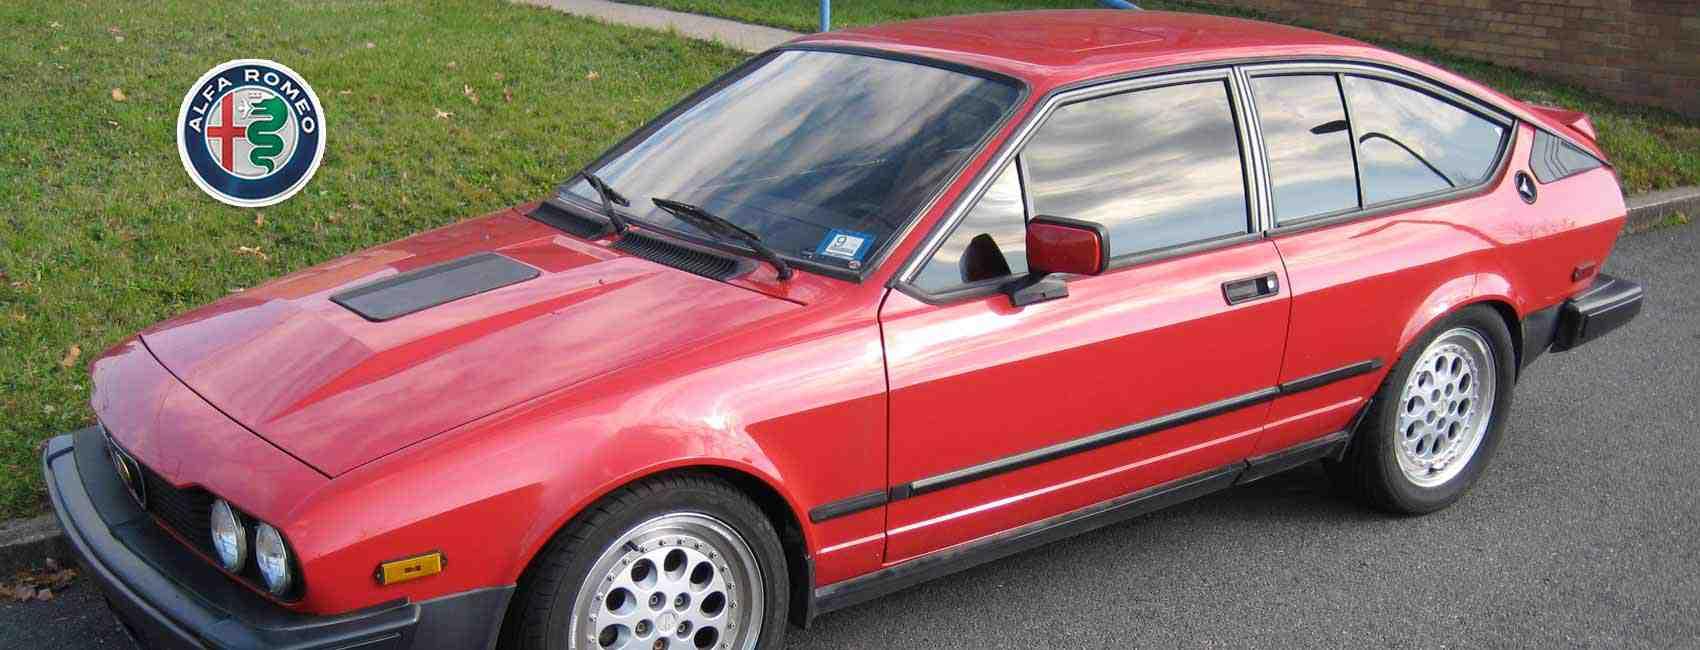 Alfa Romeo Gtv on Alfa Romeo Spider Clutch Master Cylinder